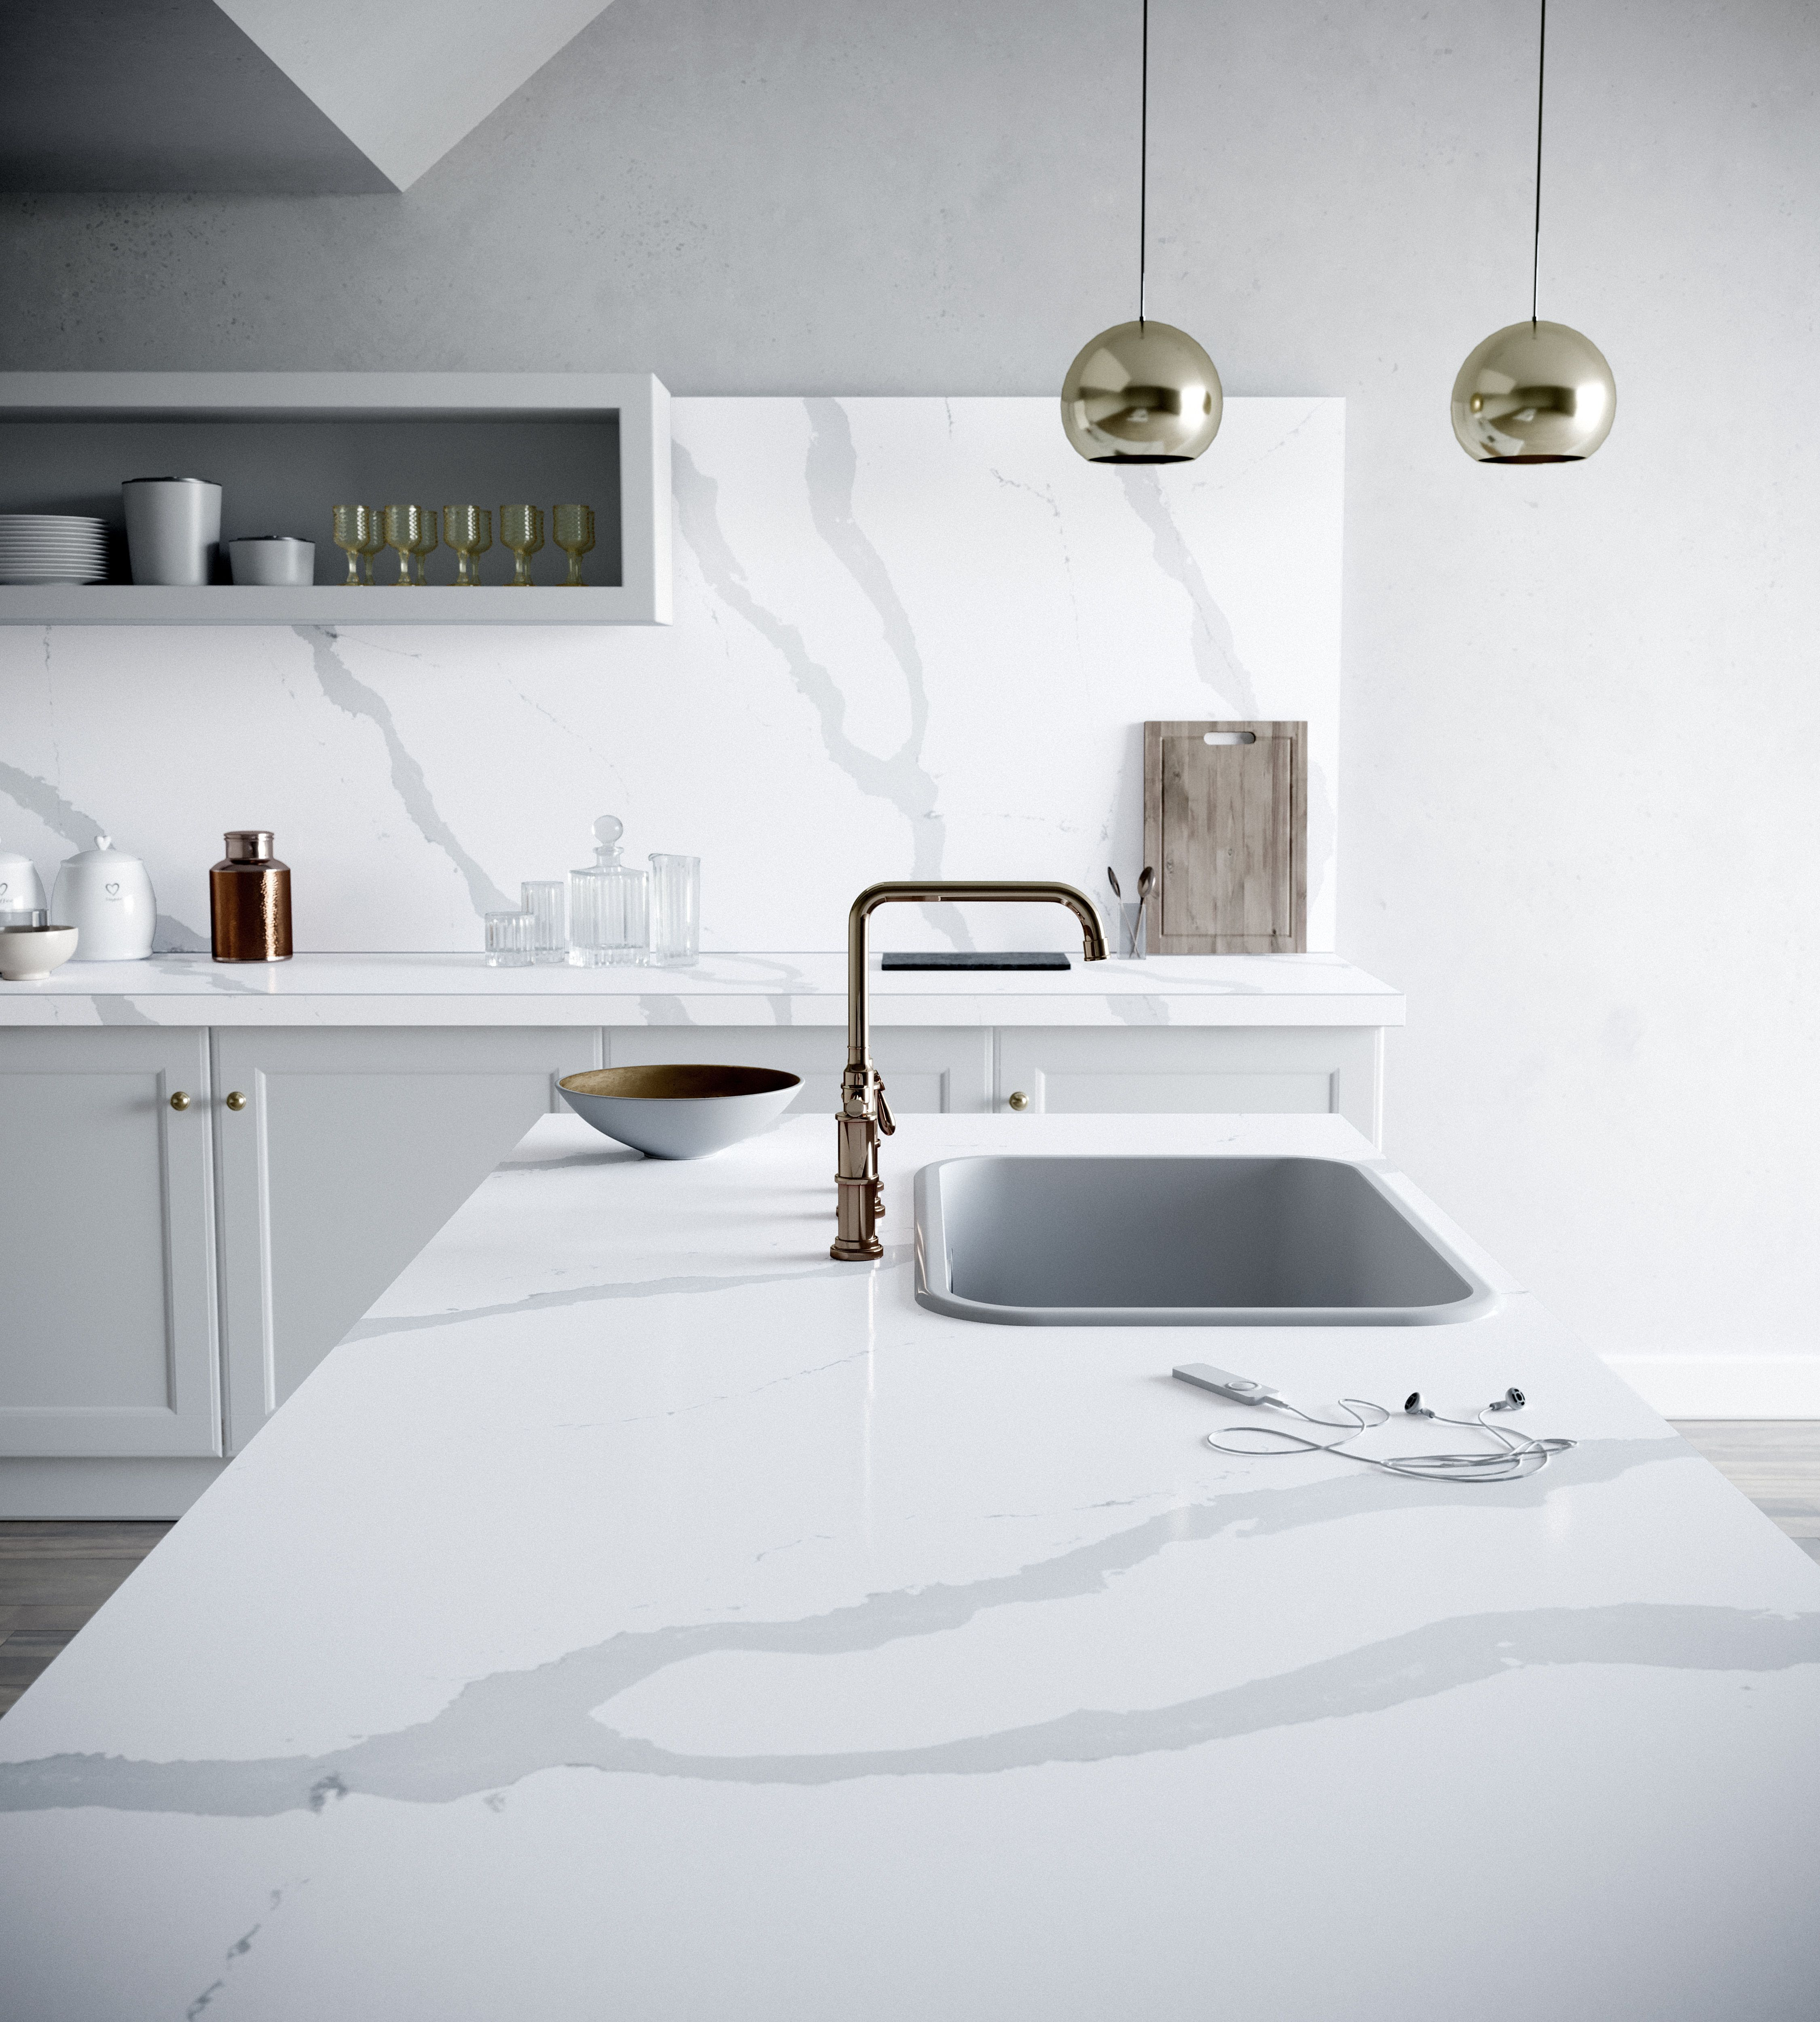 Eternal Bianco Calacatta Quartz From Silestone Love Those Big